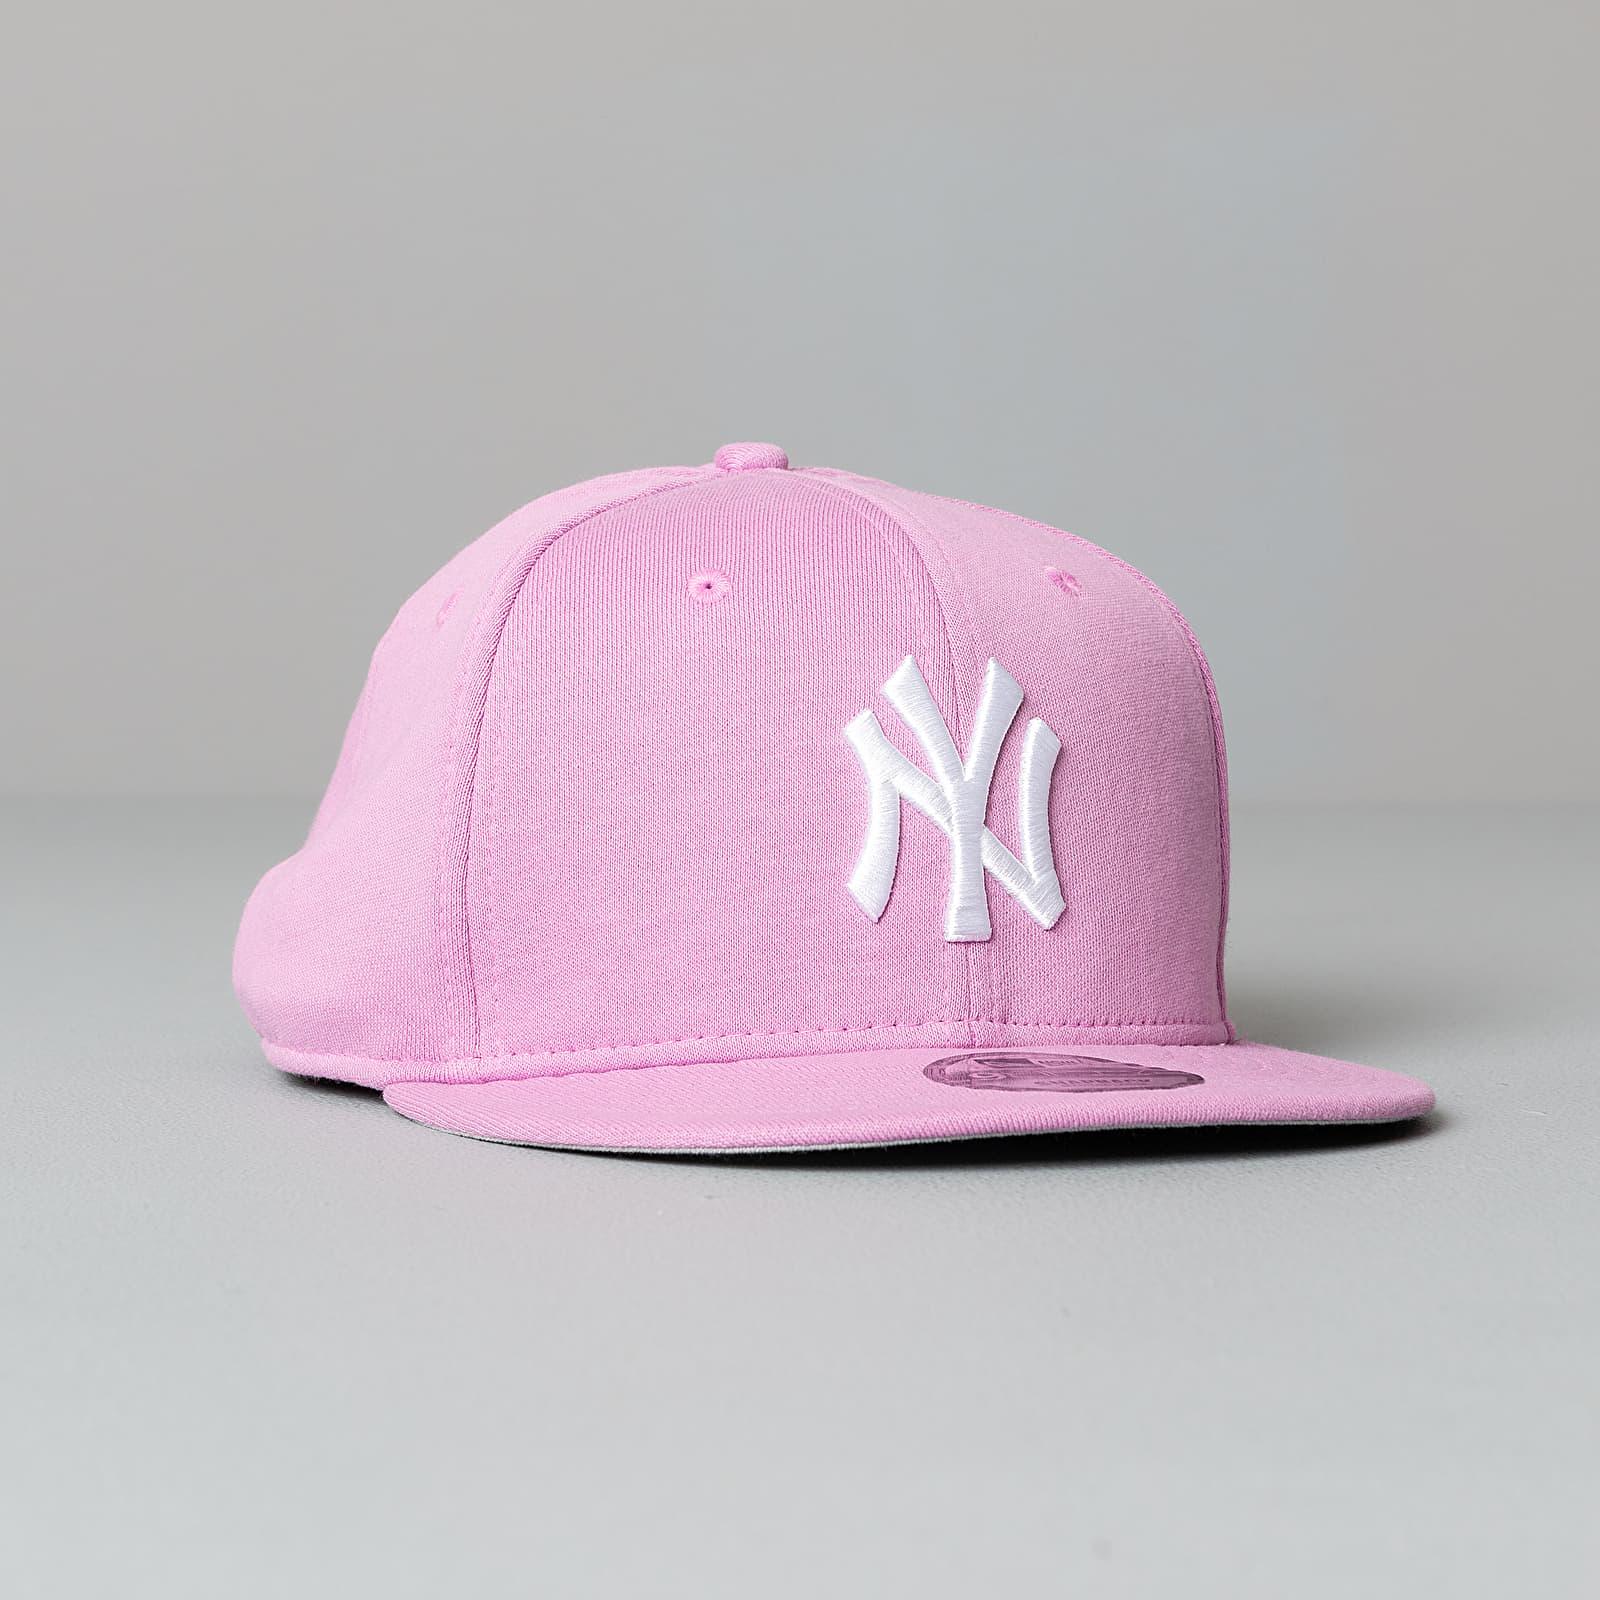 Kšiltovky New Era 9Fifty MLB Jersey Pack New York Yankees Cap Purple